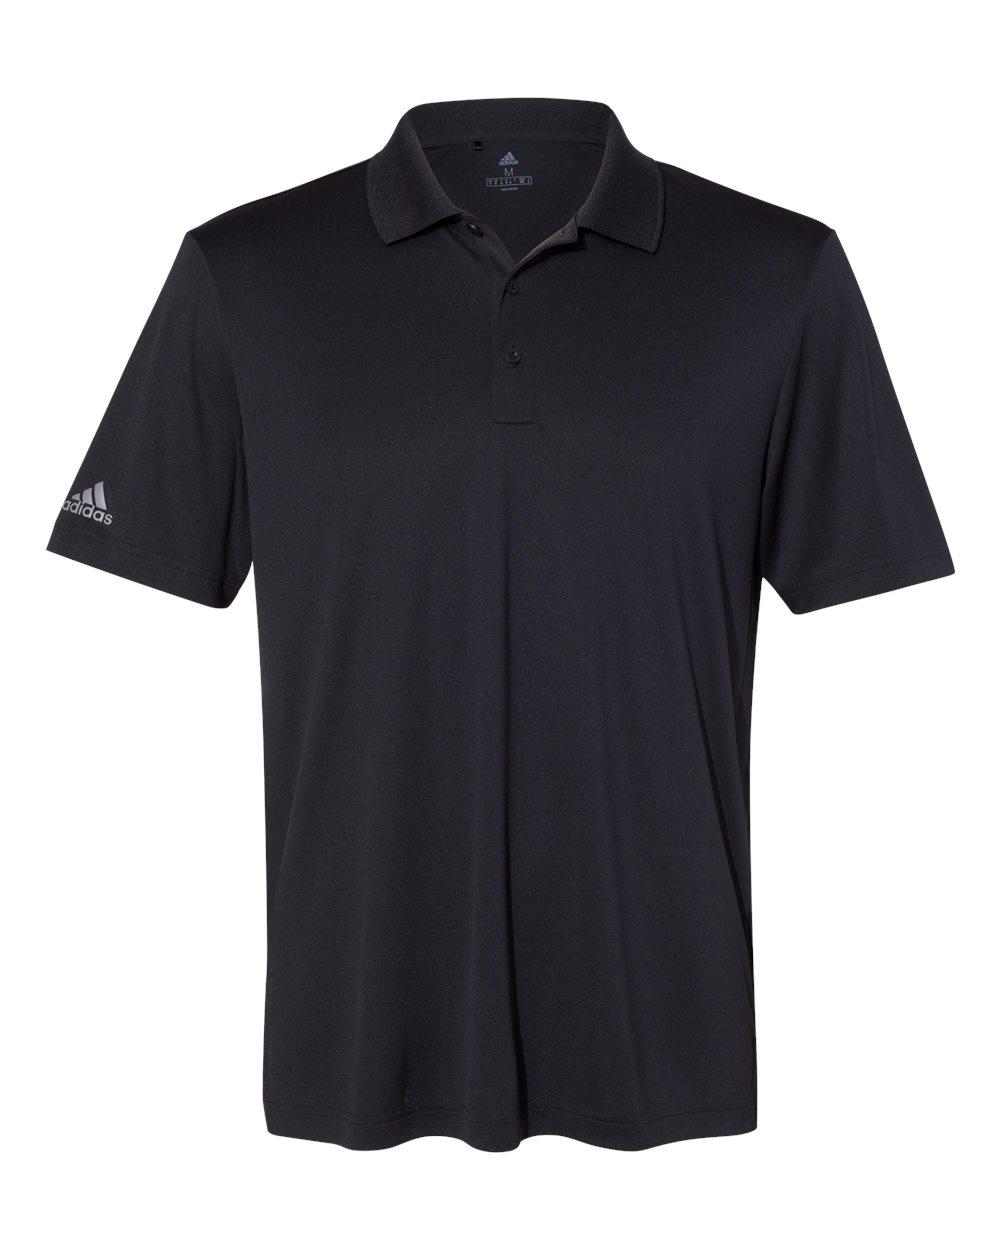 Adidas - Performance Sport Shirt-Adidas